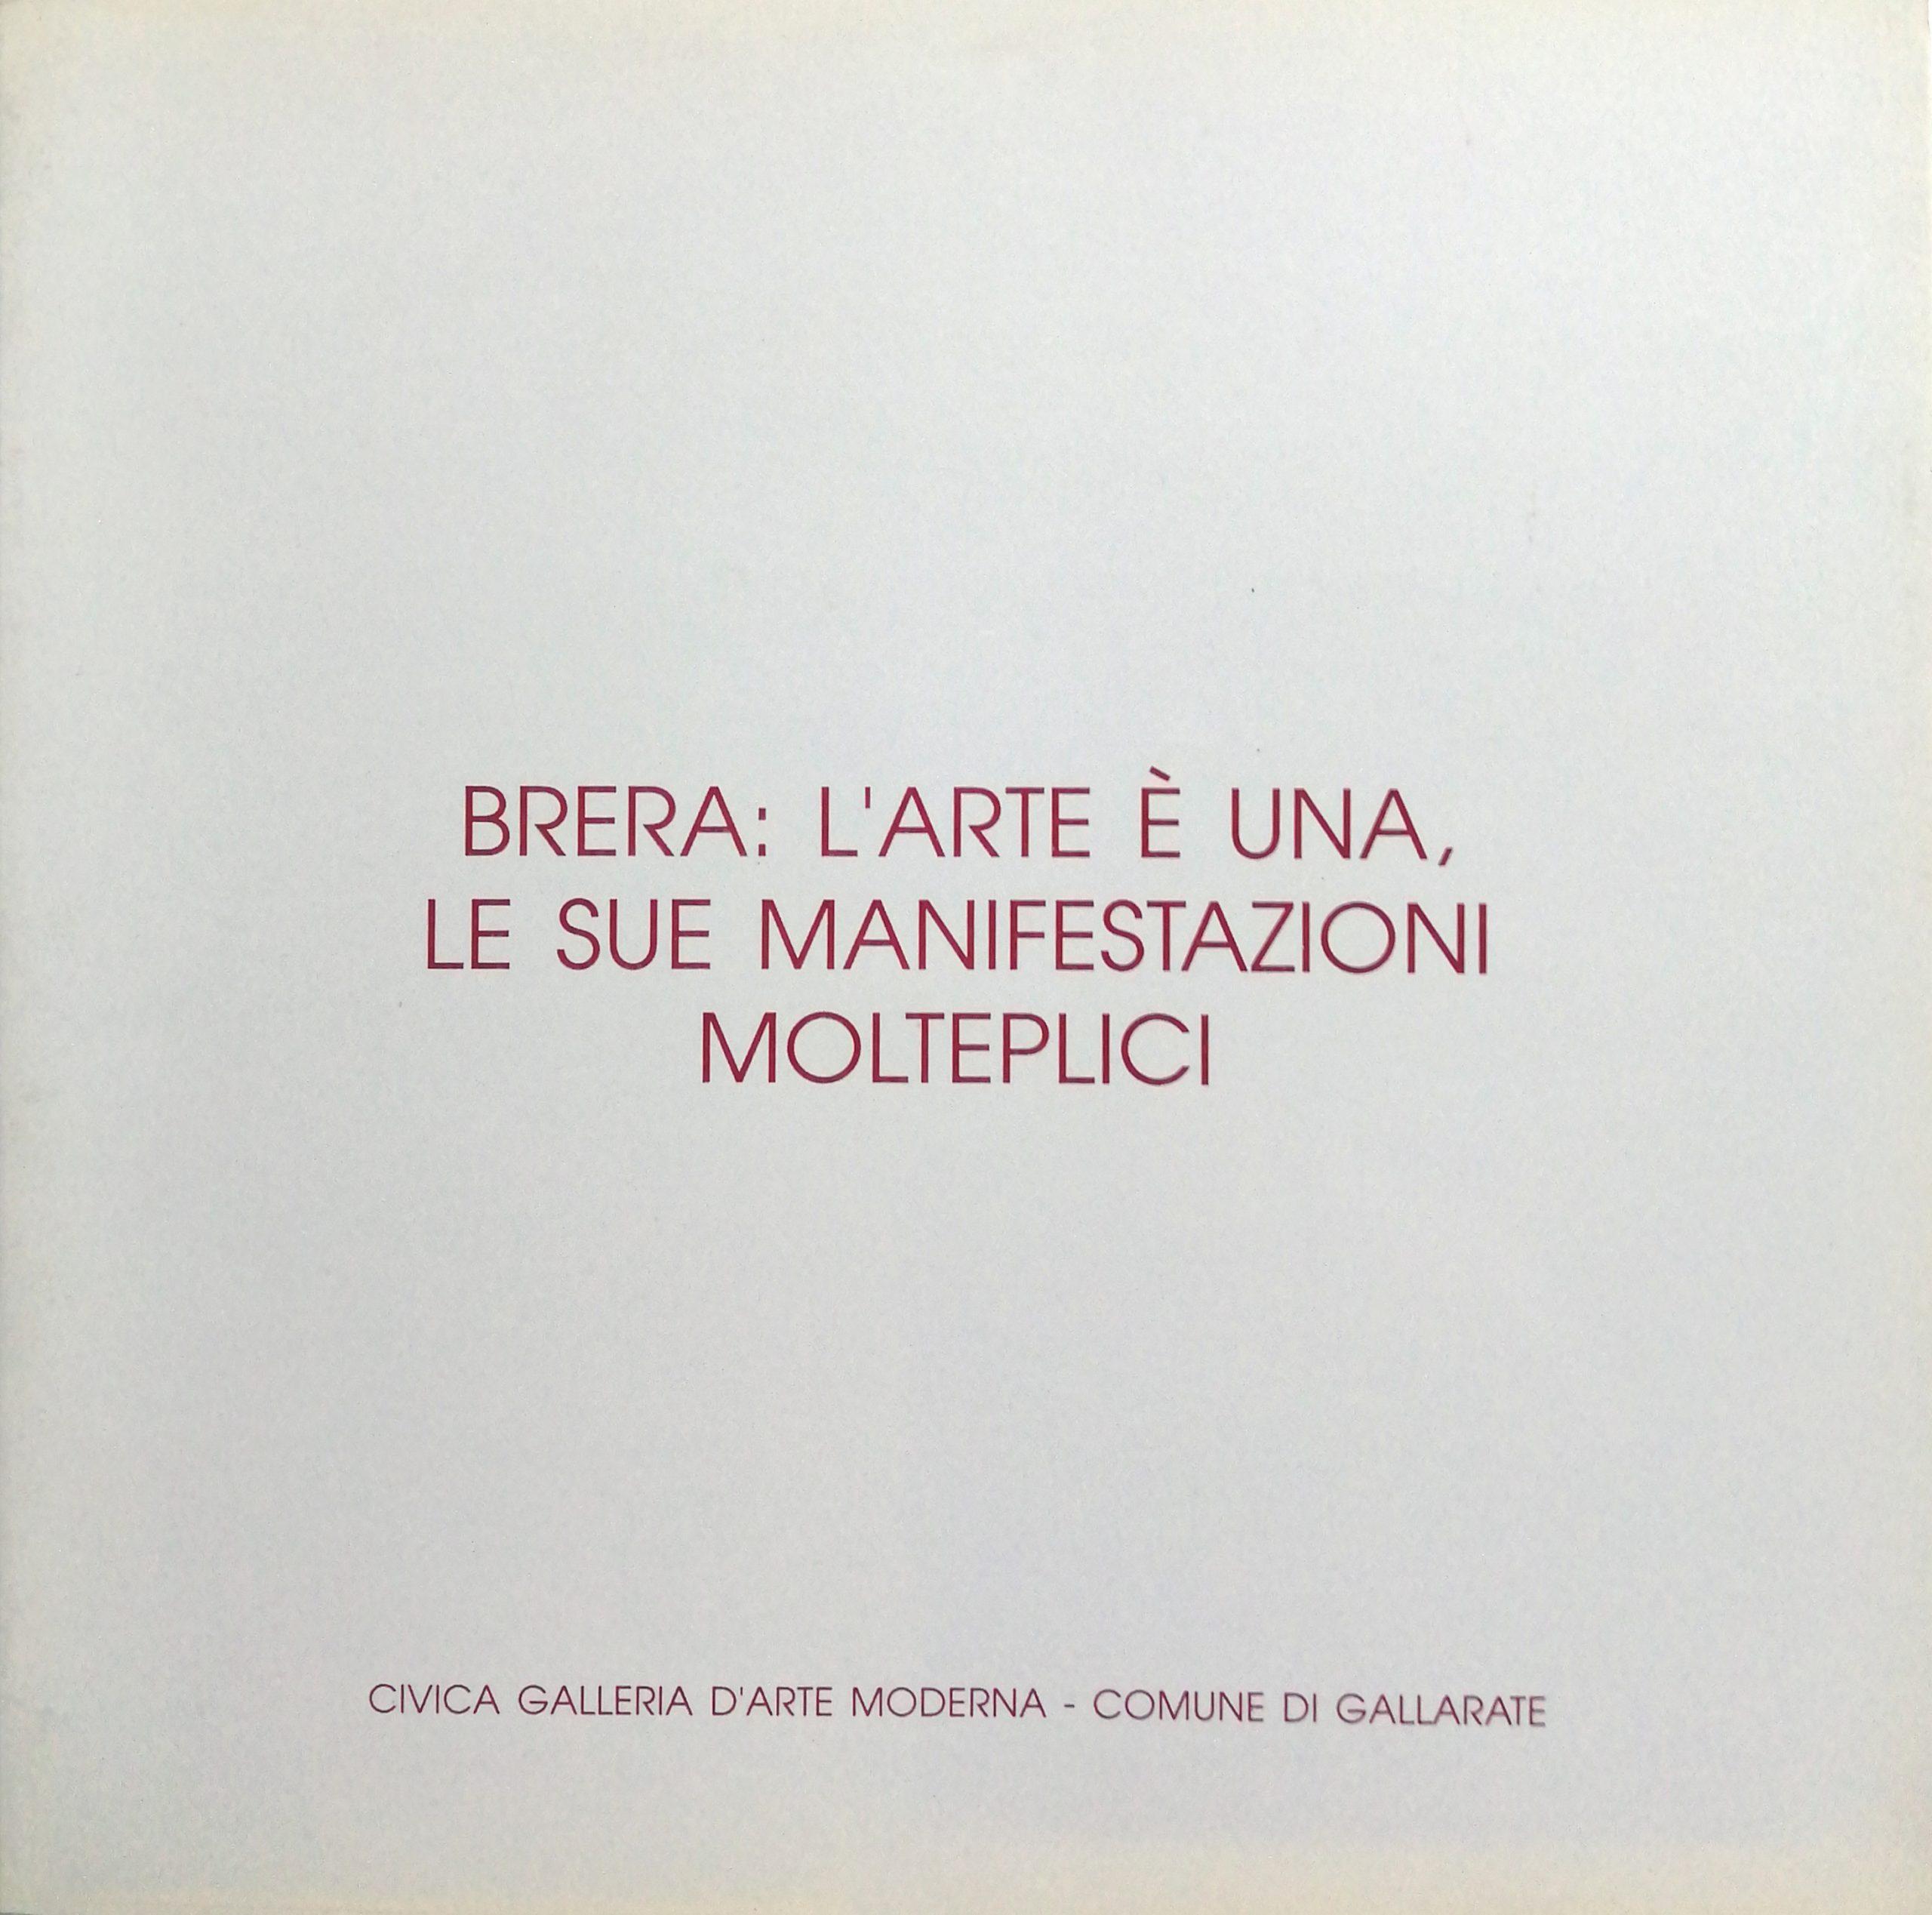 1995 Brera Musei Civici Gallarate scaled - Bibliography/ Catalogues